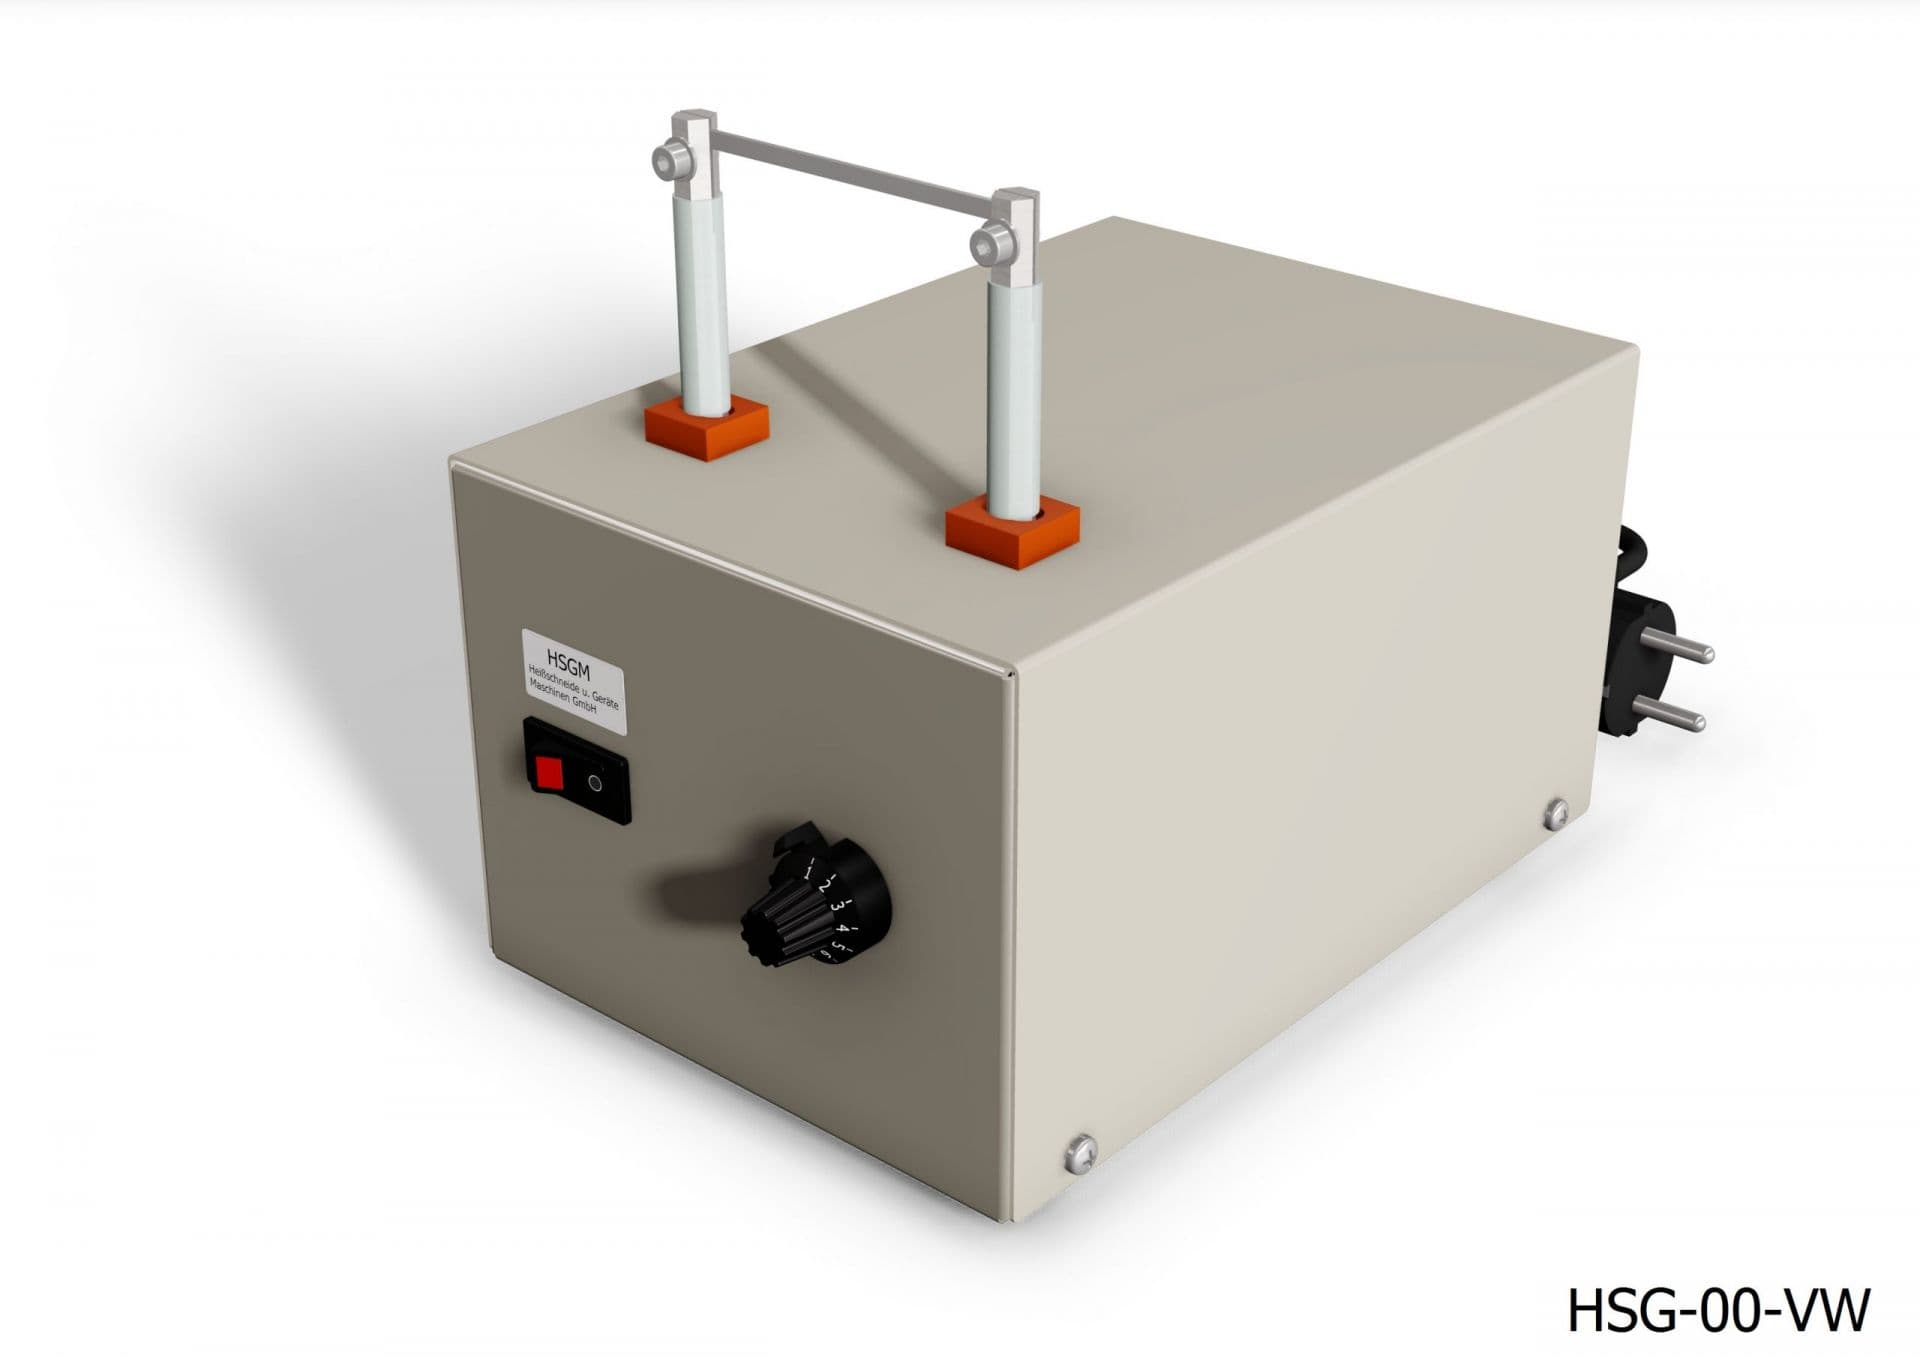 Heißschneidegerät HSG-00-VW